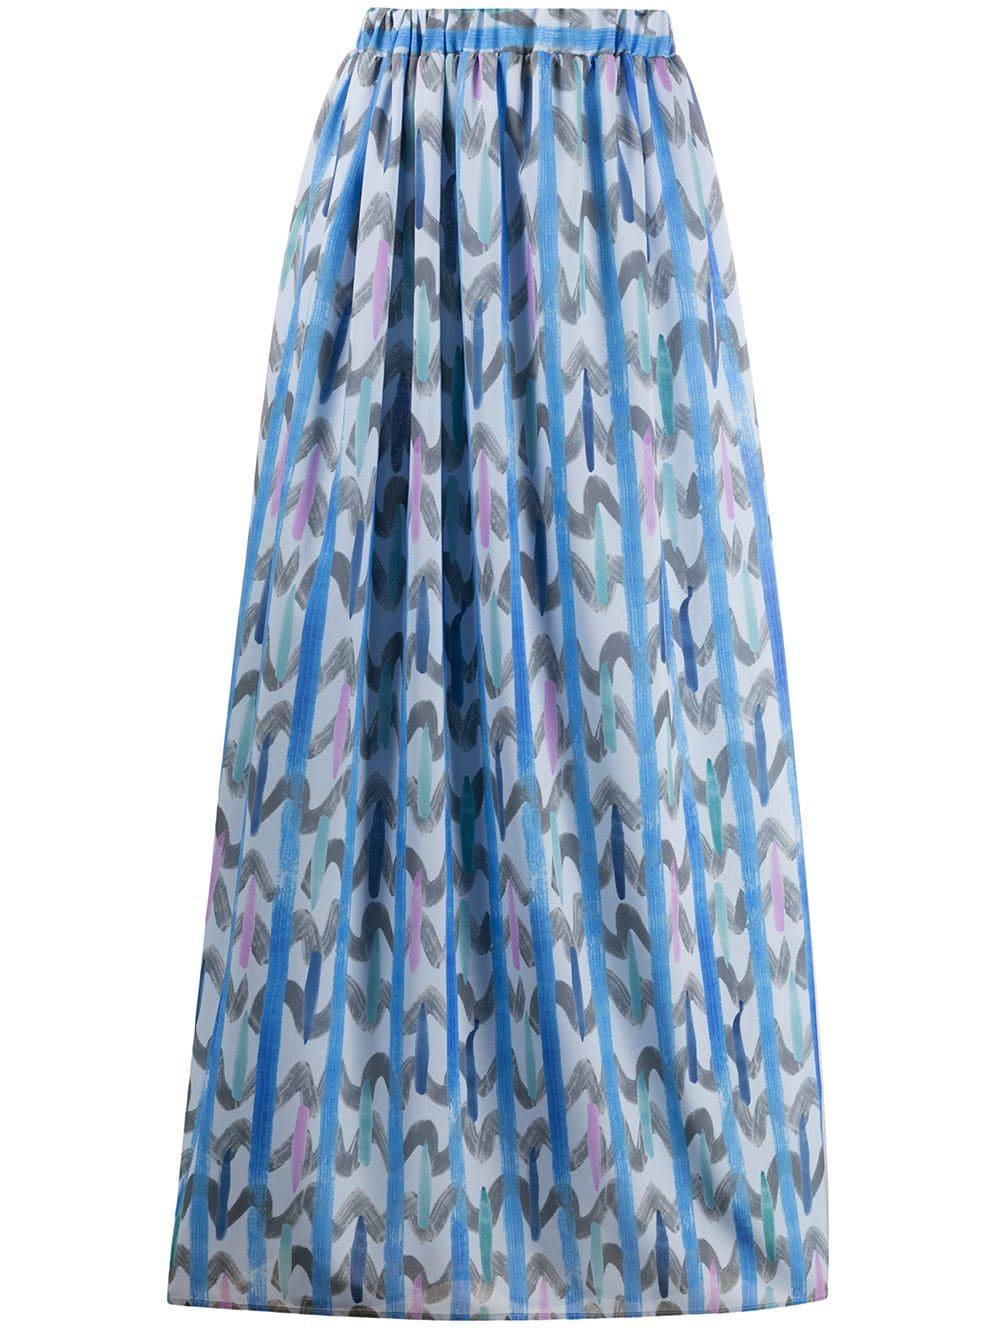 Chevron Print Skirt